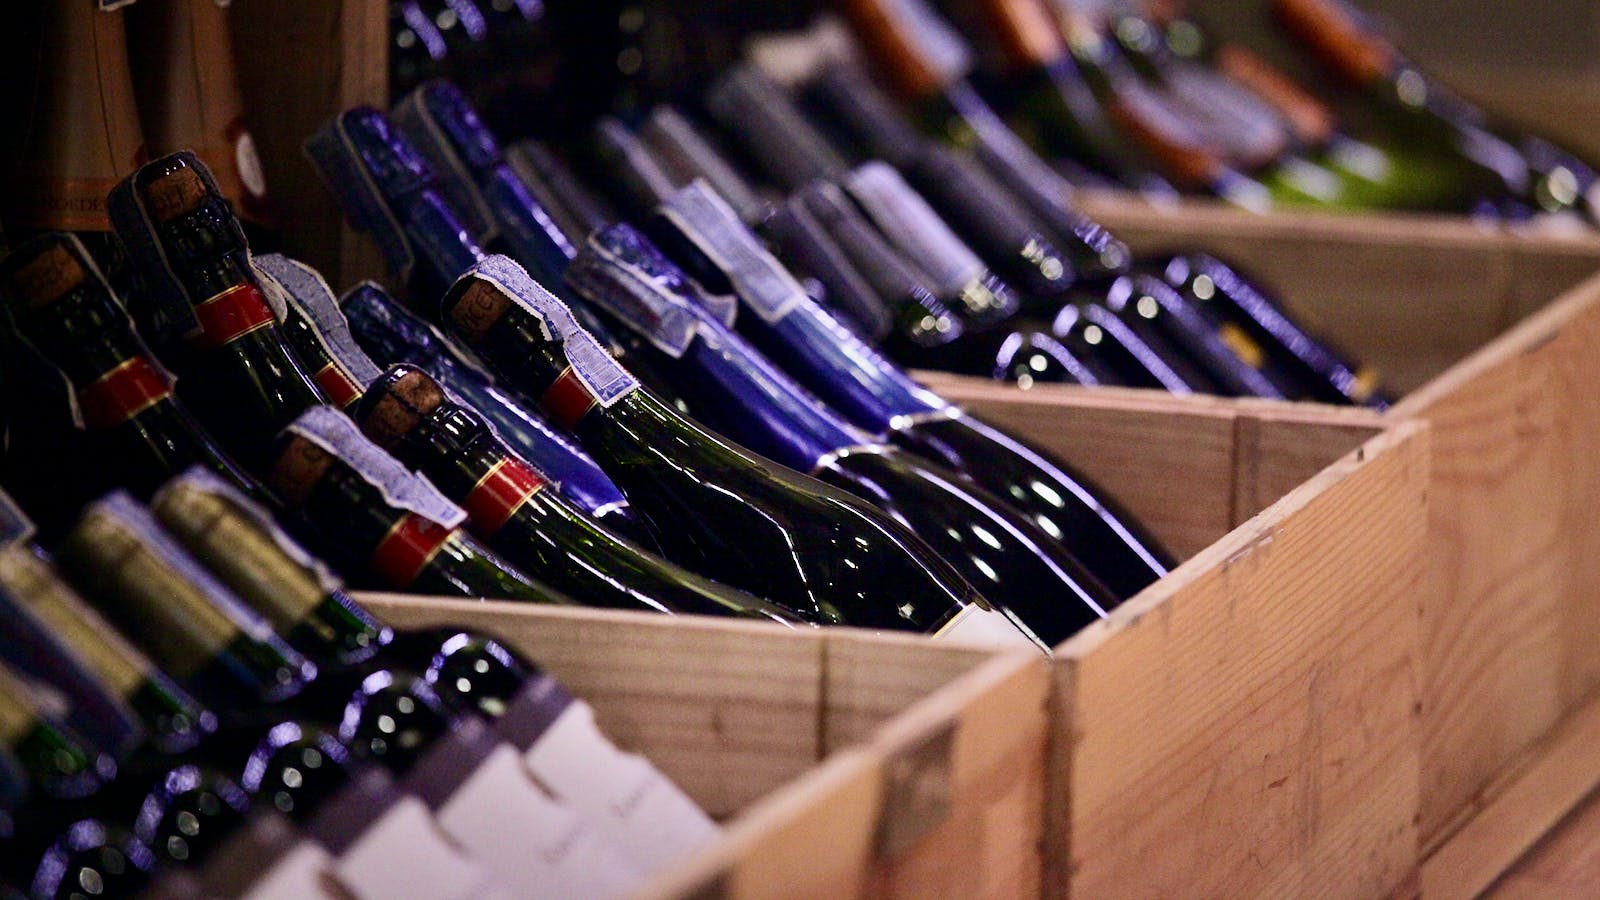 EU Wine Faces Threat of 100% Tariffs